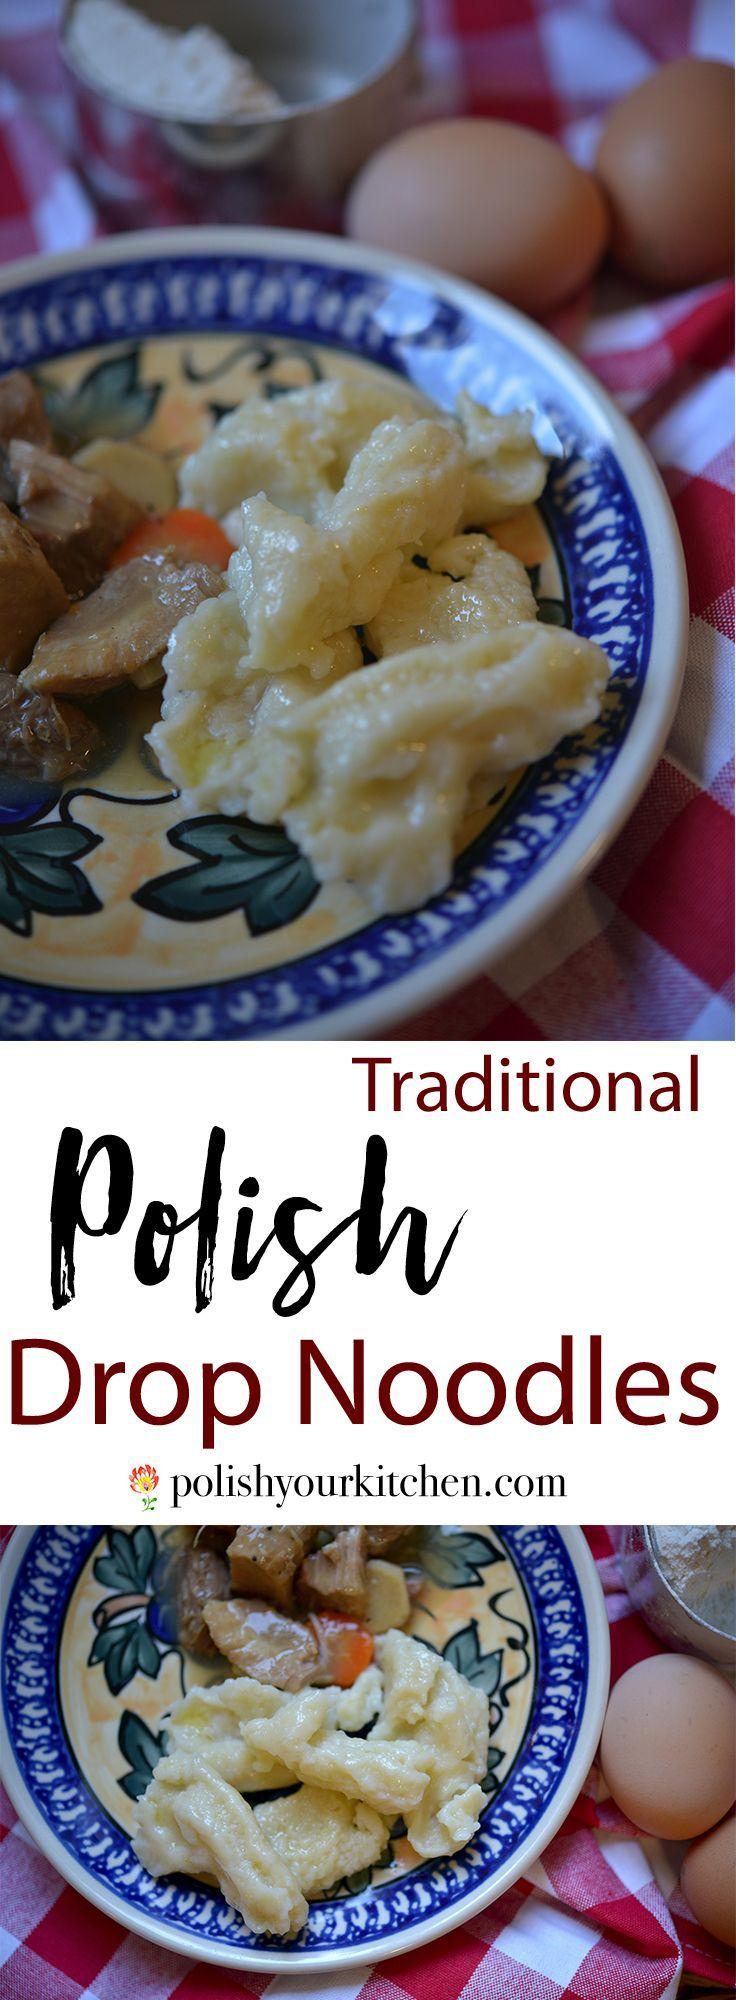 Traditional Polish Drop Noodles recipe #Polishrecipesauthentic #Recipes